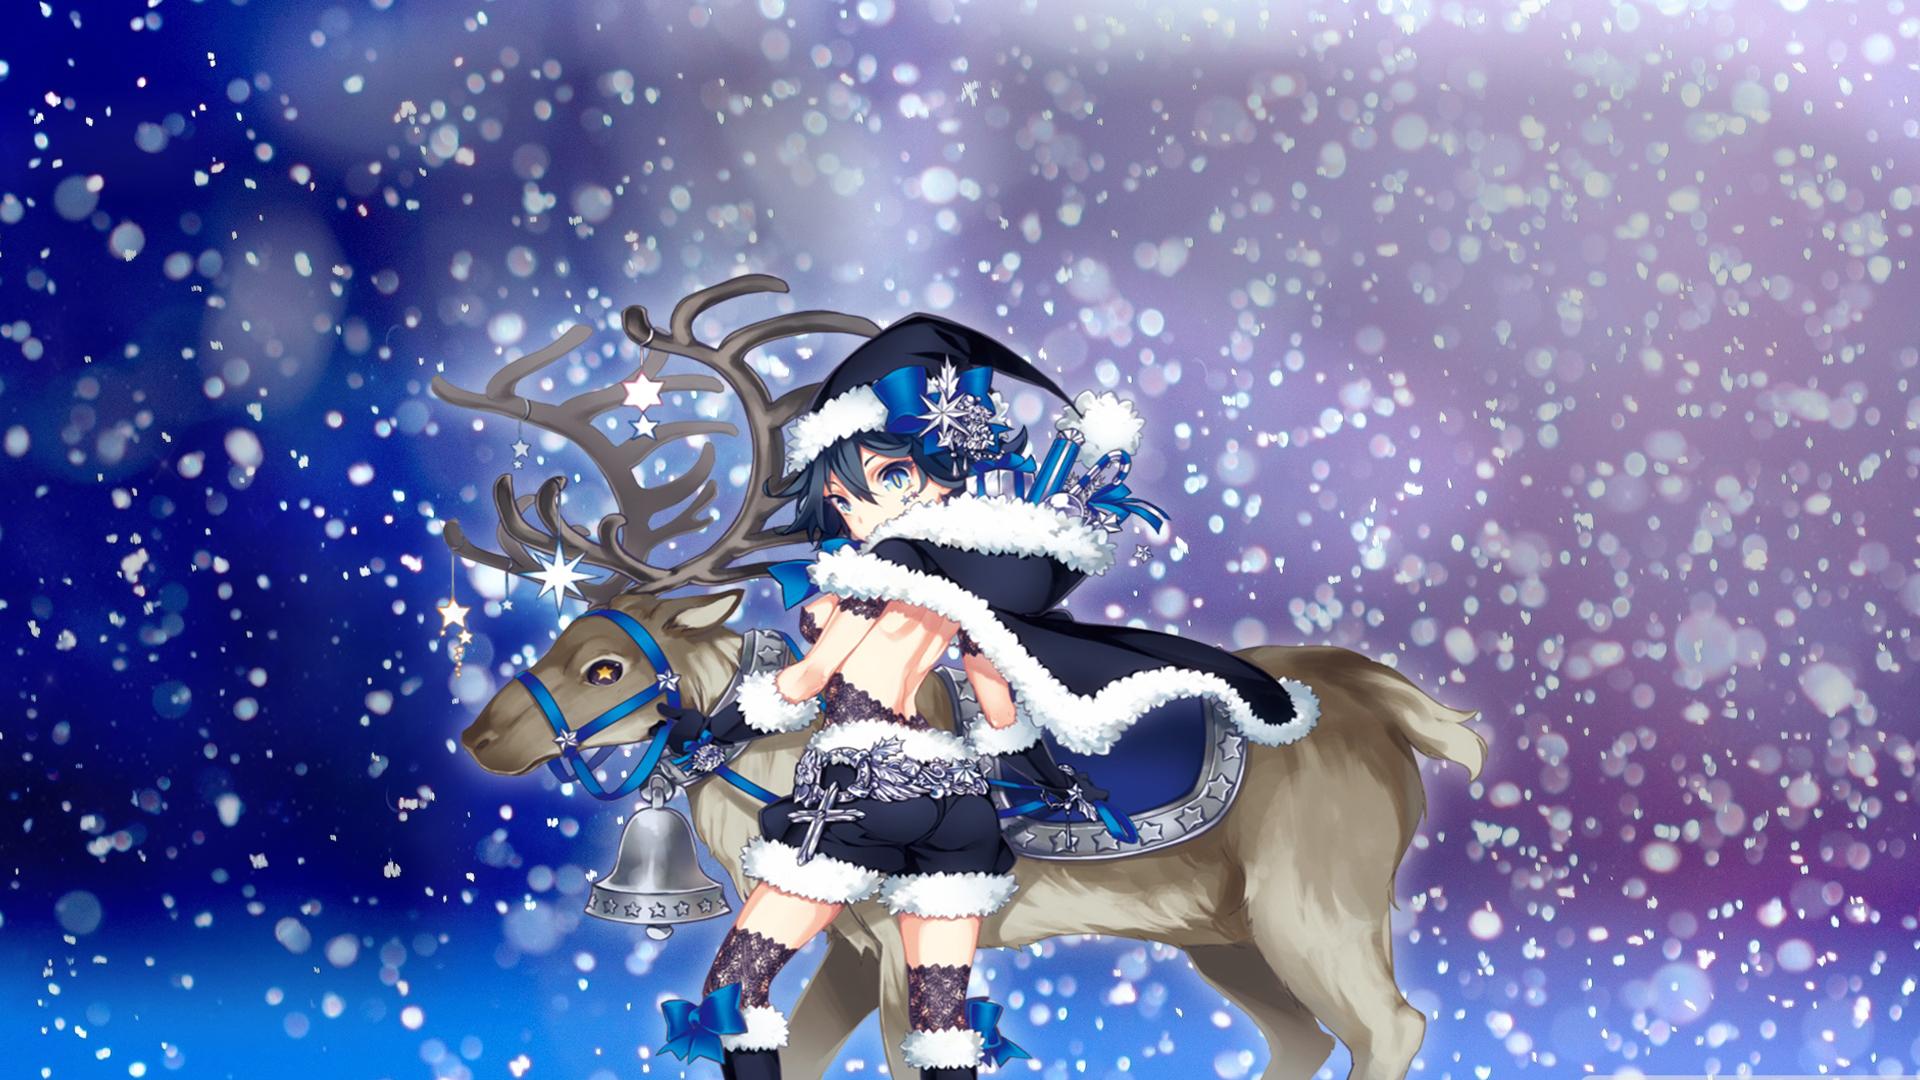 Blue Anime Girl Christmas Wallpaper By Callmeteddy